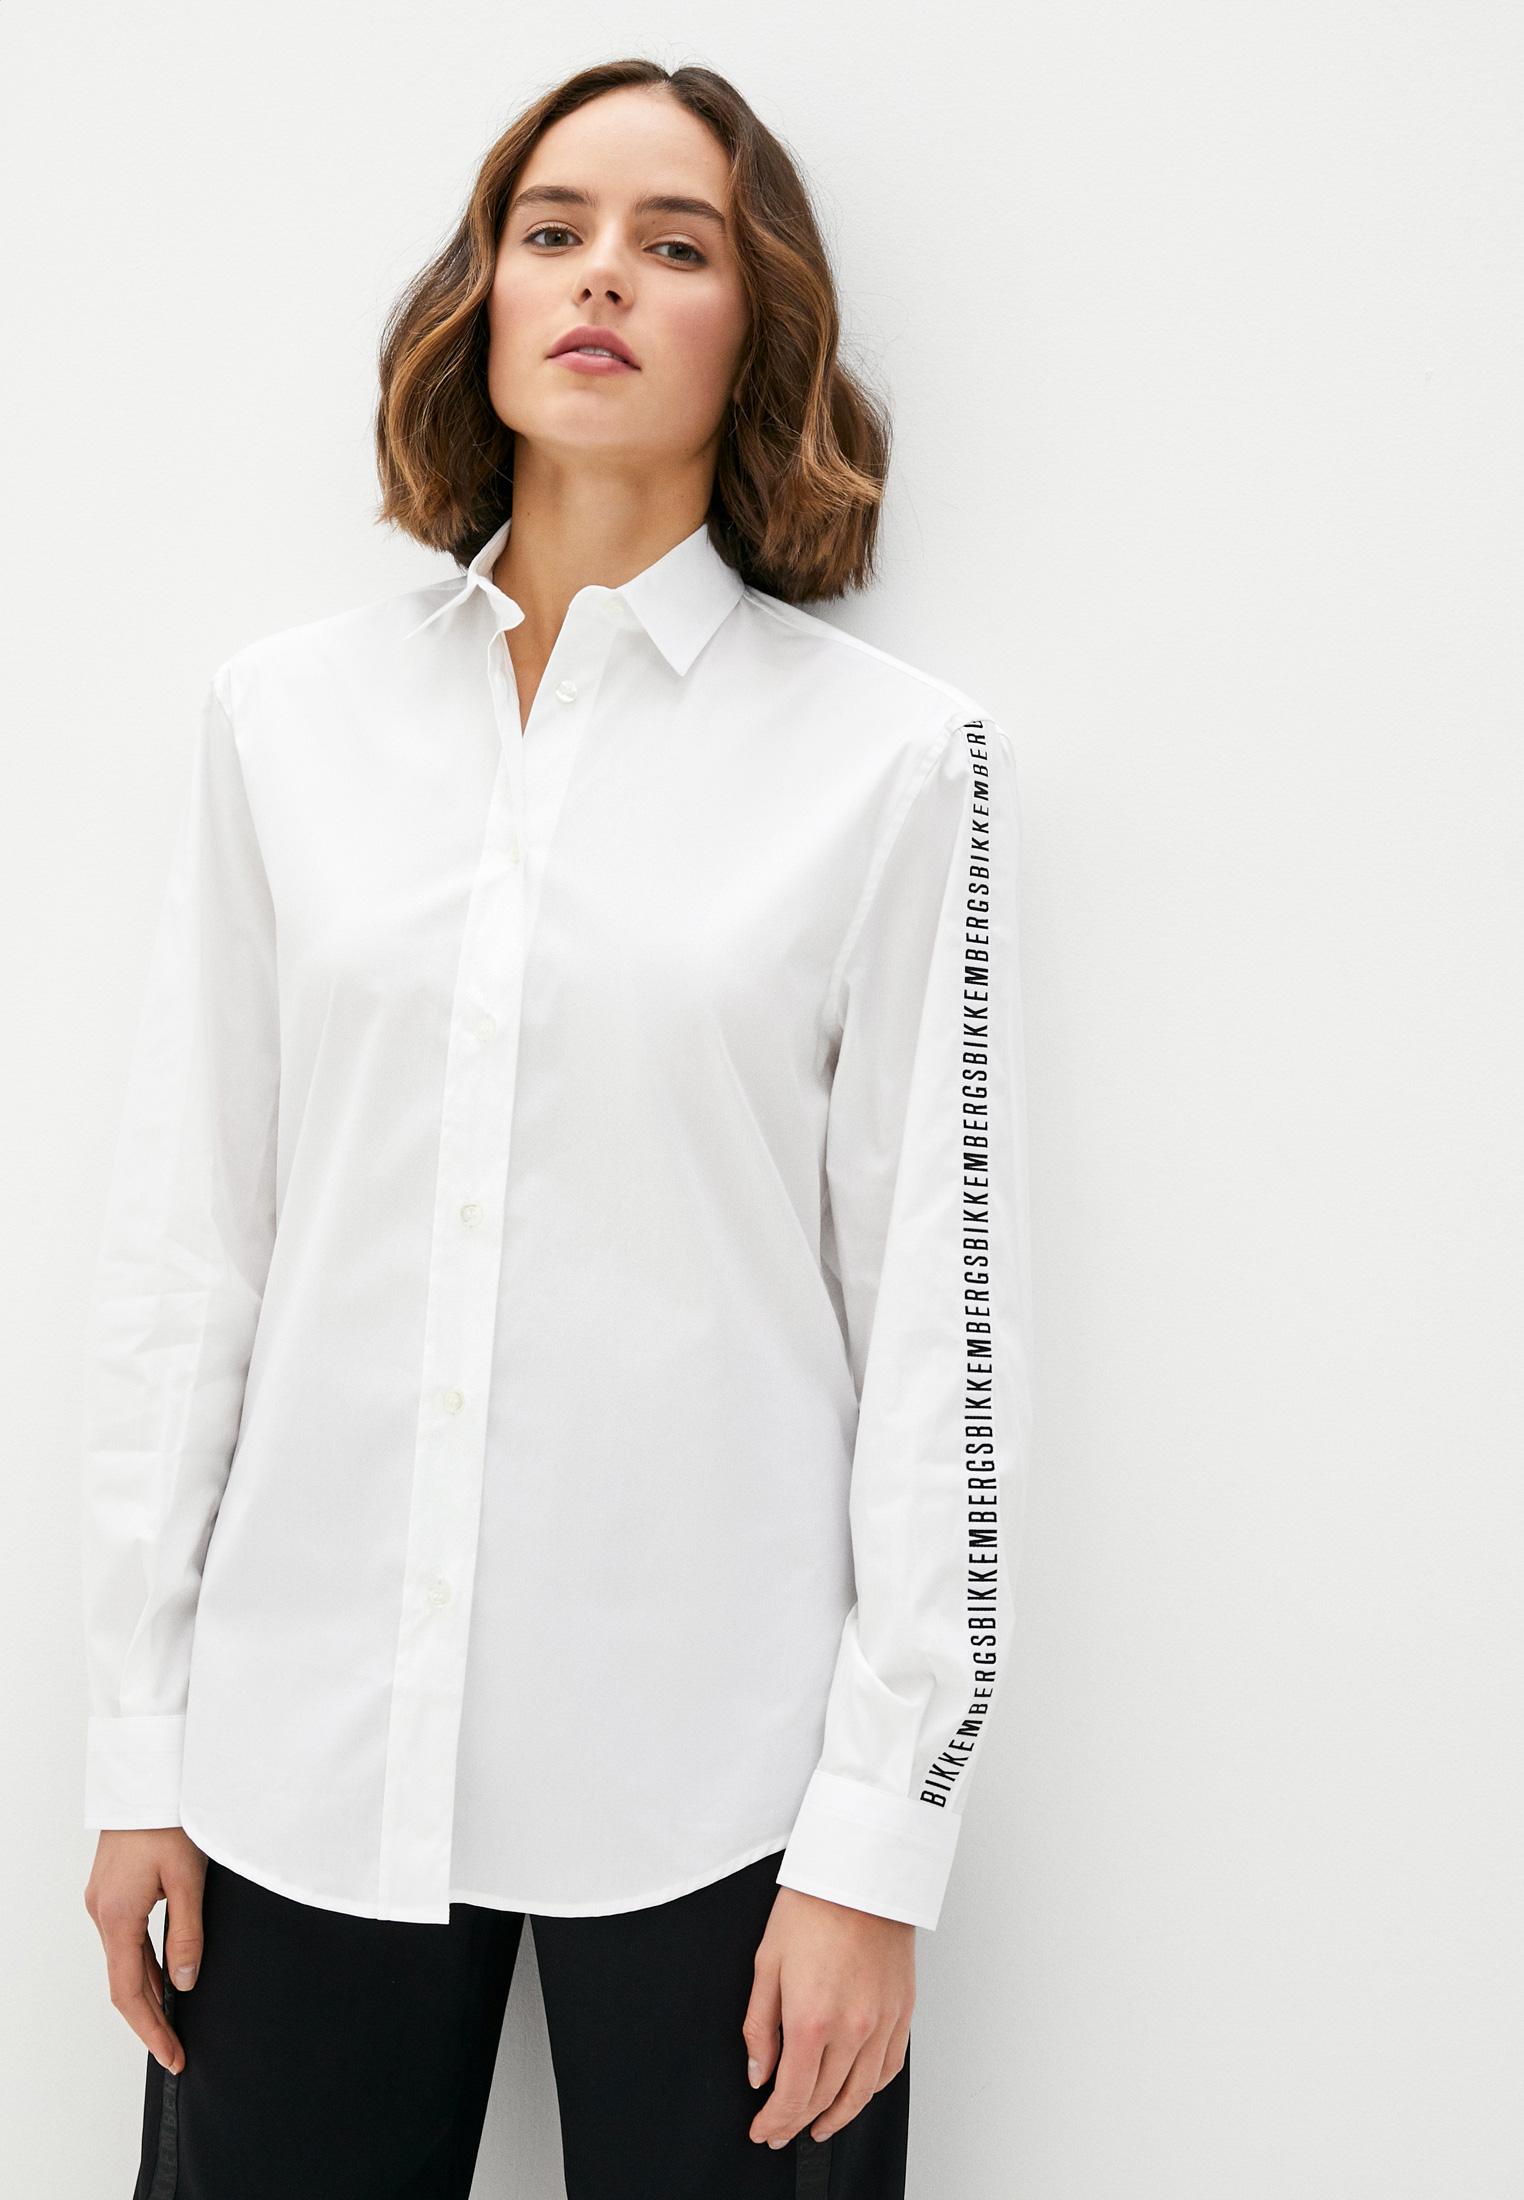 Женские рубашки с длинным рукавом Bikkembergs D C 033 81 S 2931